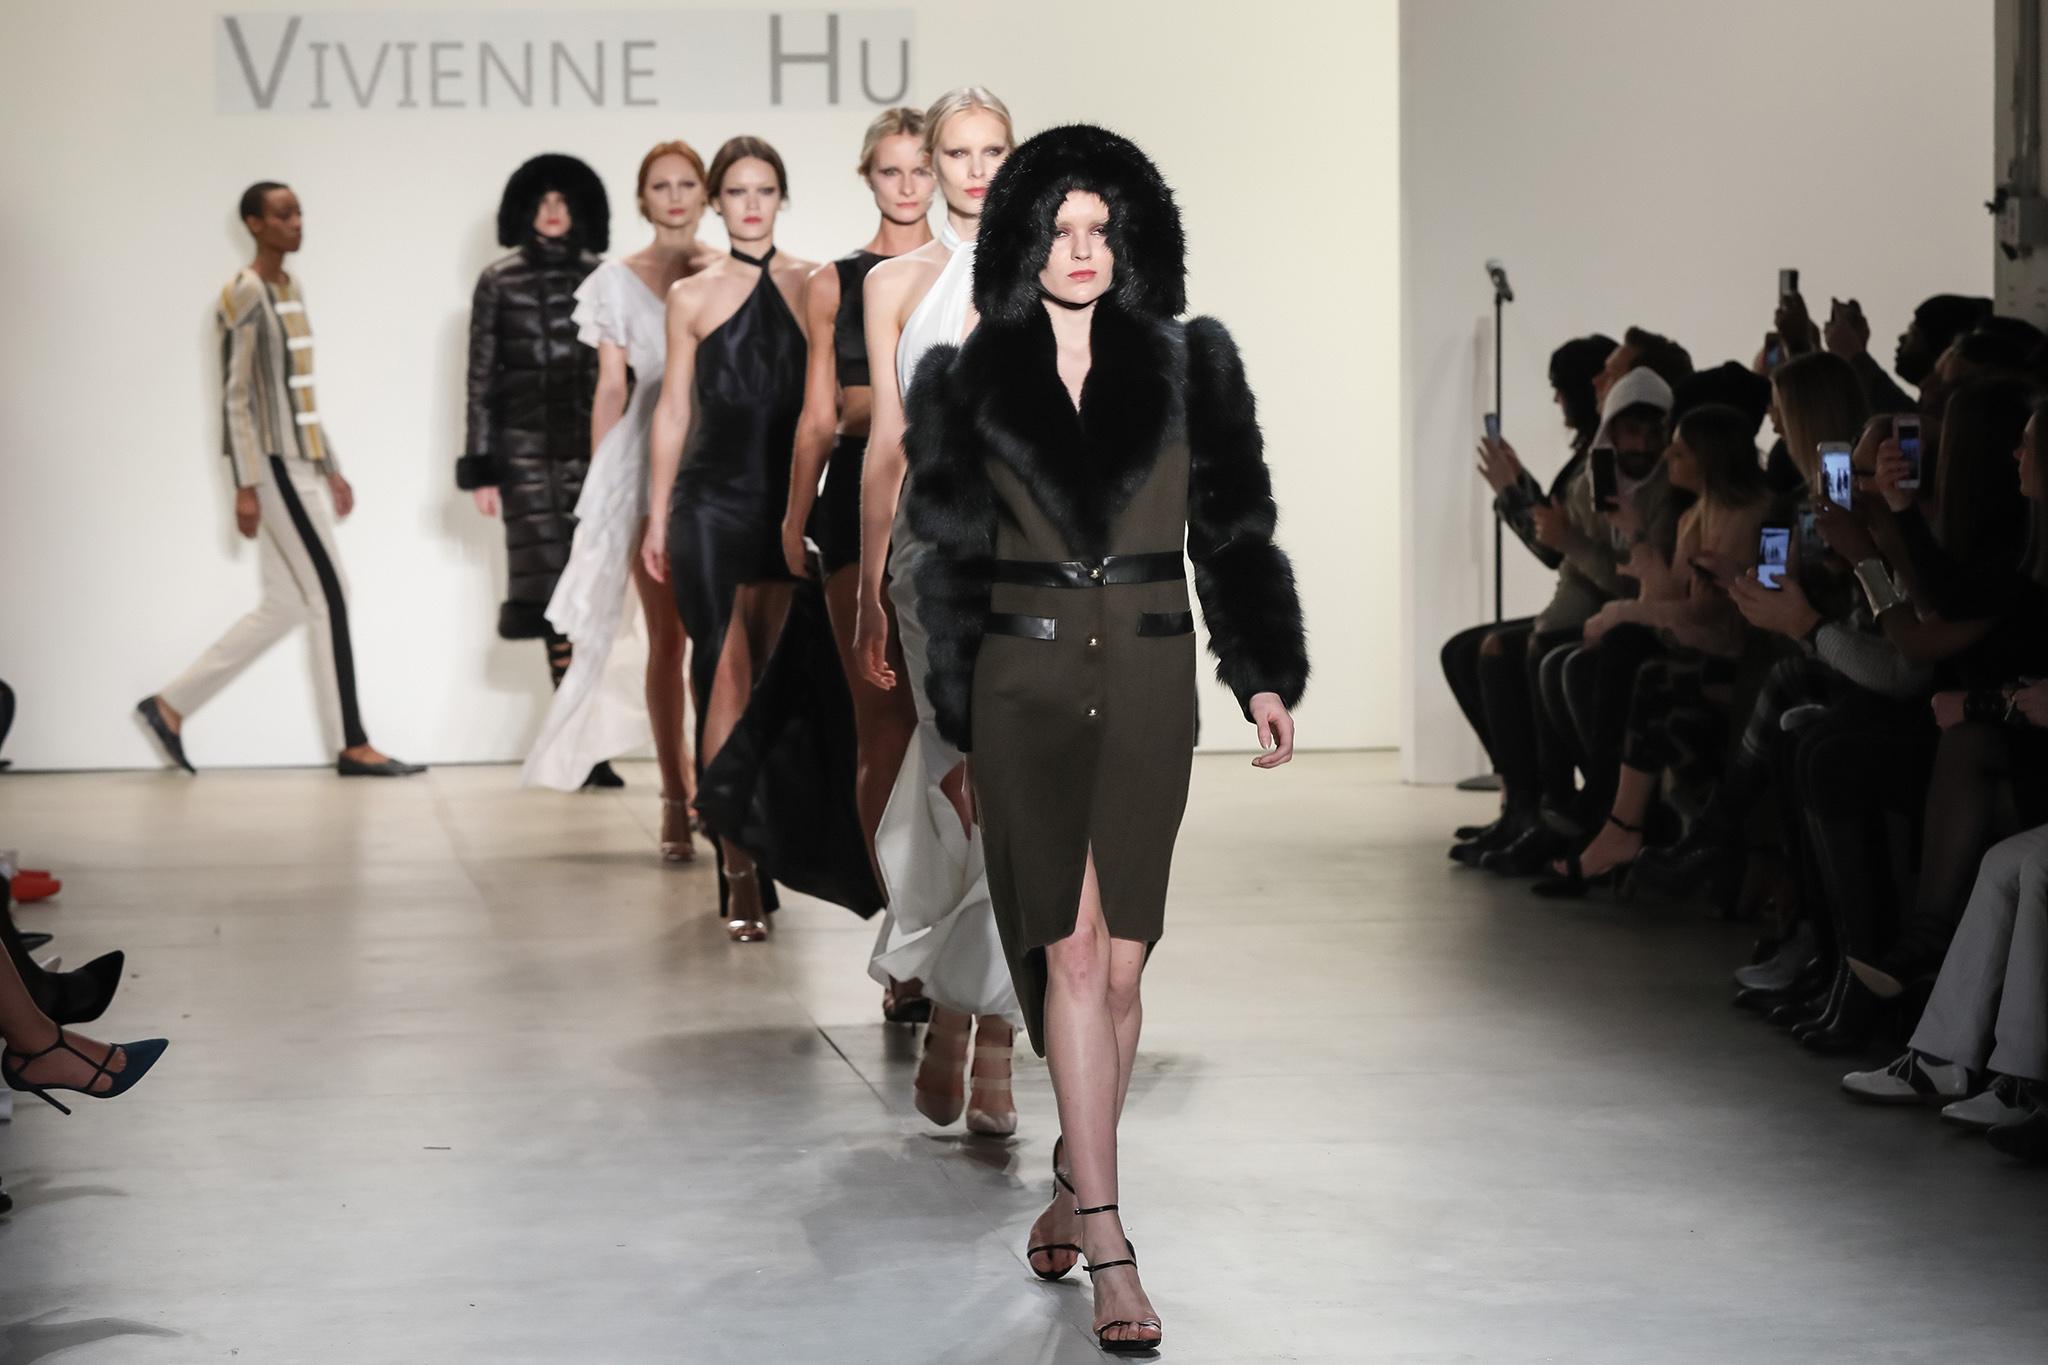 Vivienne Hu RTW Fall 2017